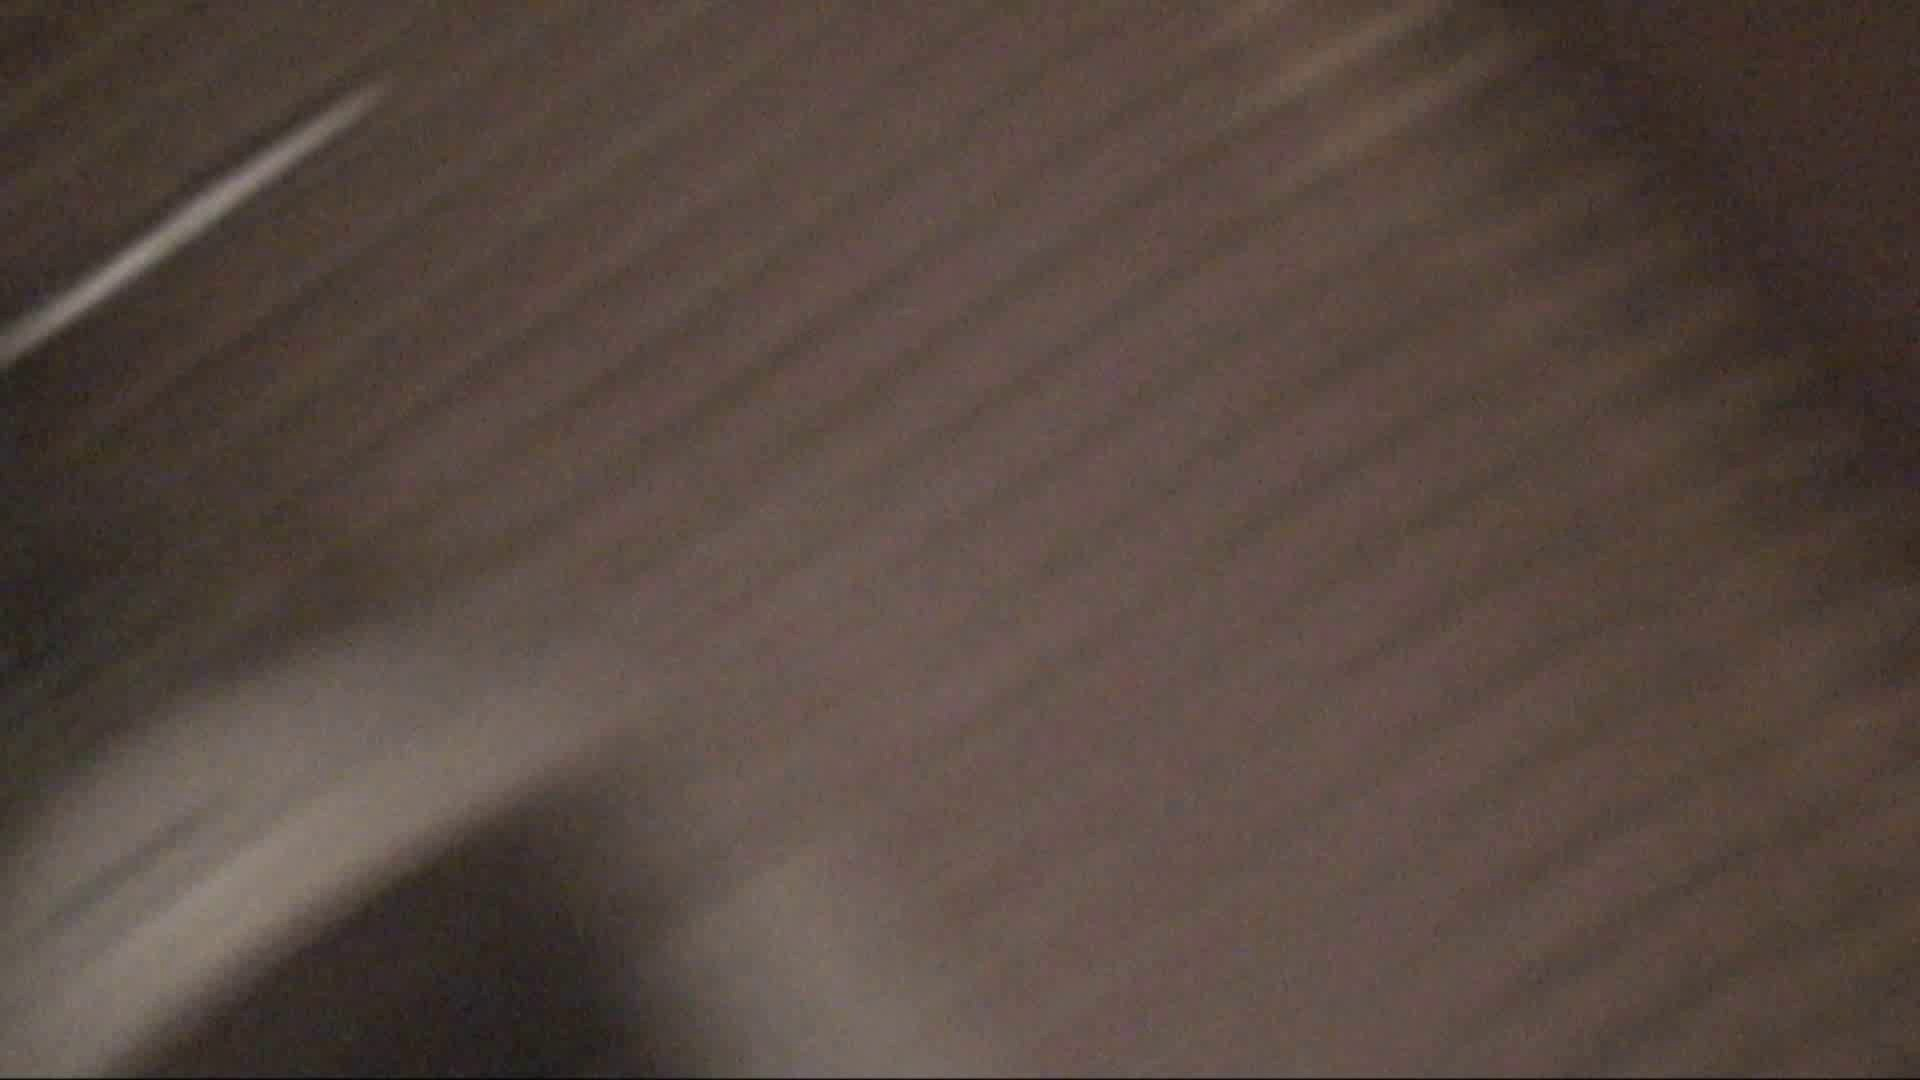 洗面所内潜入!同級生が同級生を盗撮! vol.02 洗面所 隠し撮りオマンコ動画紹介 98PIX 50